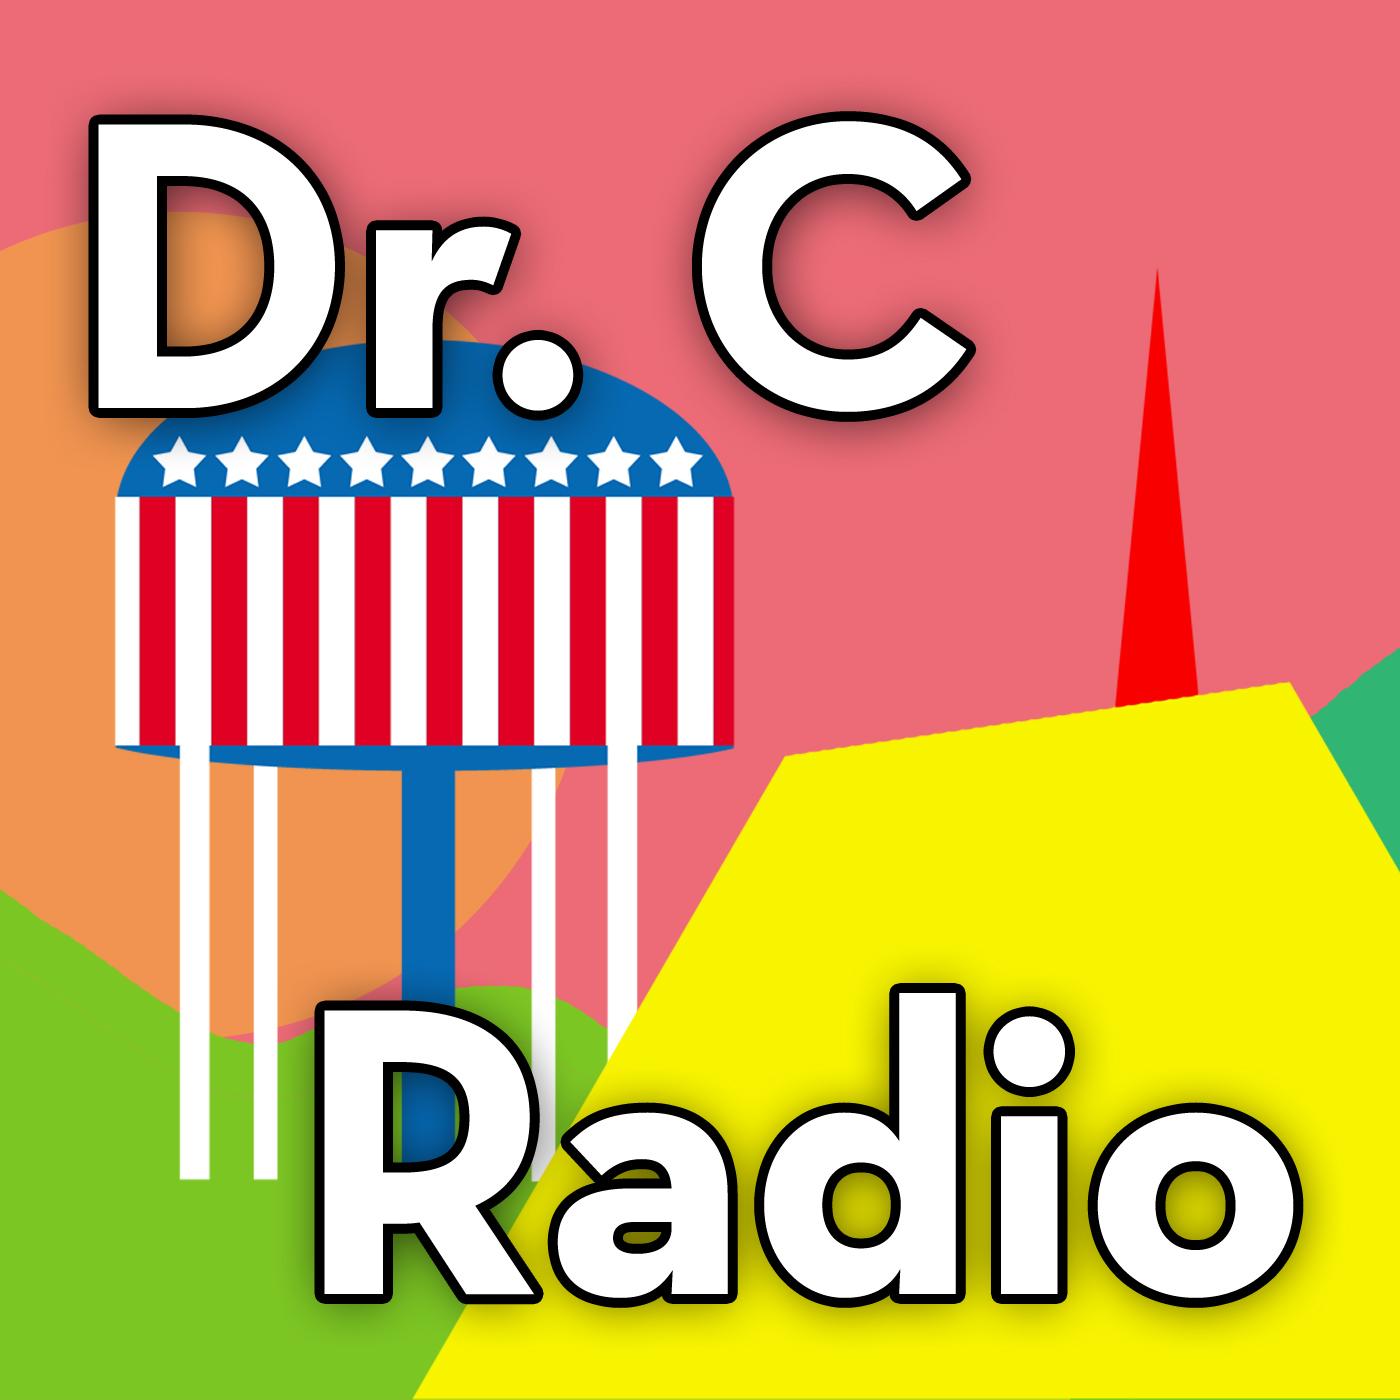 Dr. C Radio